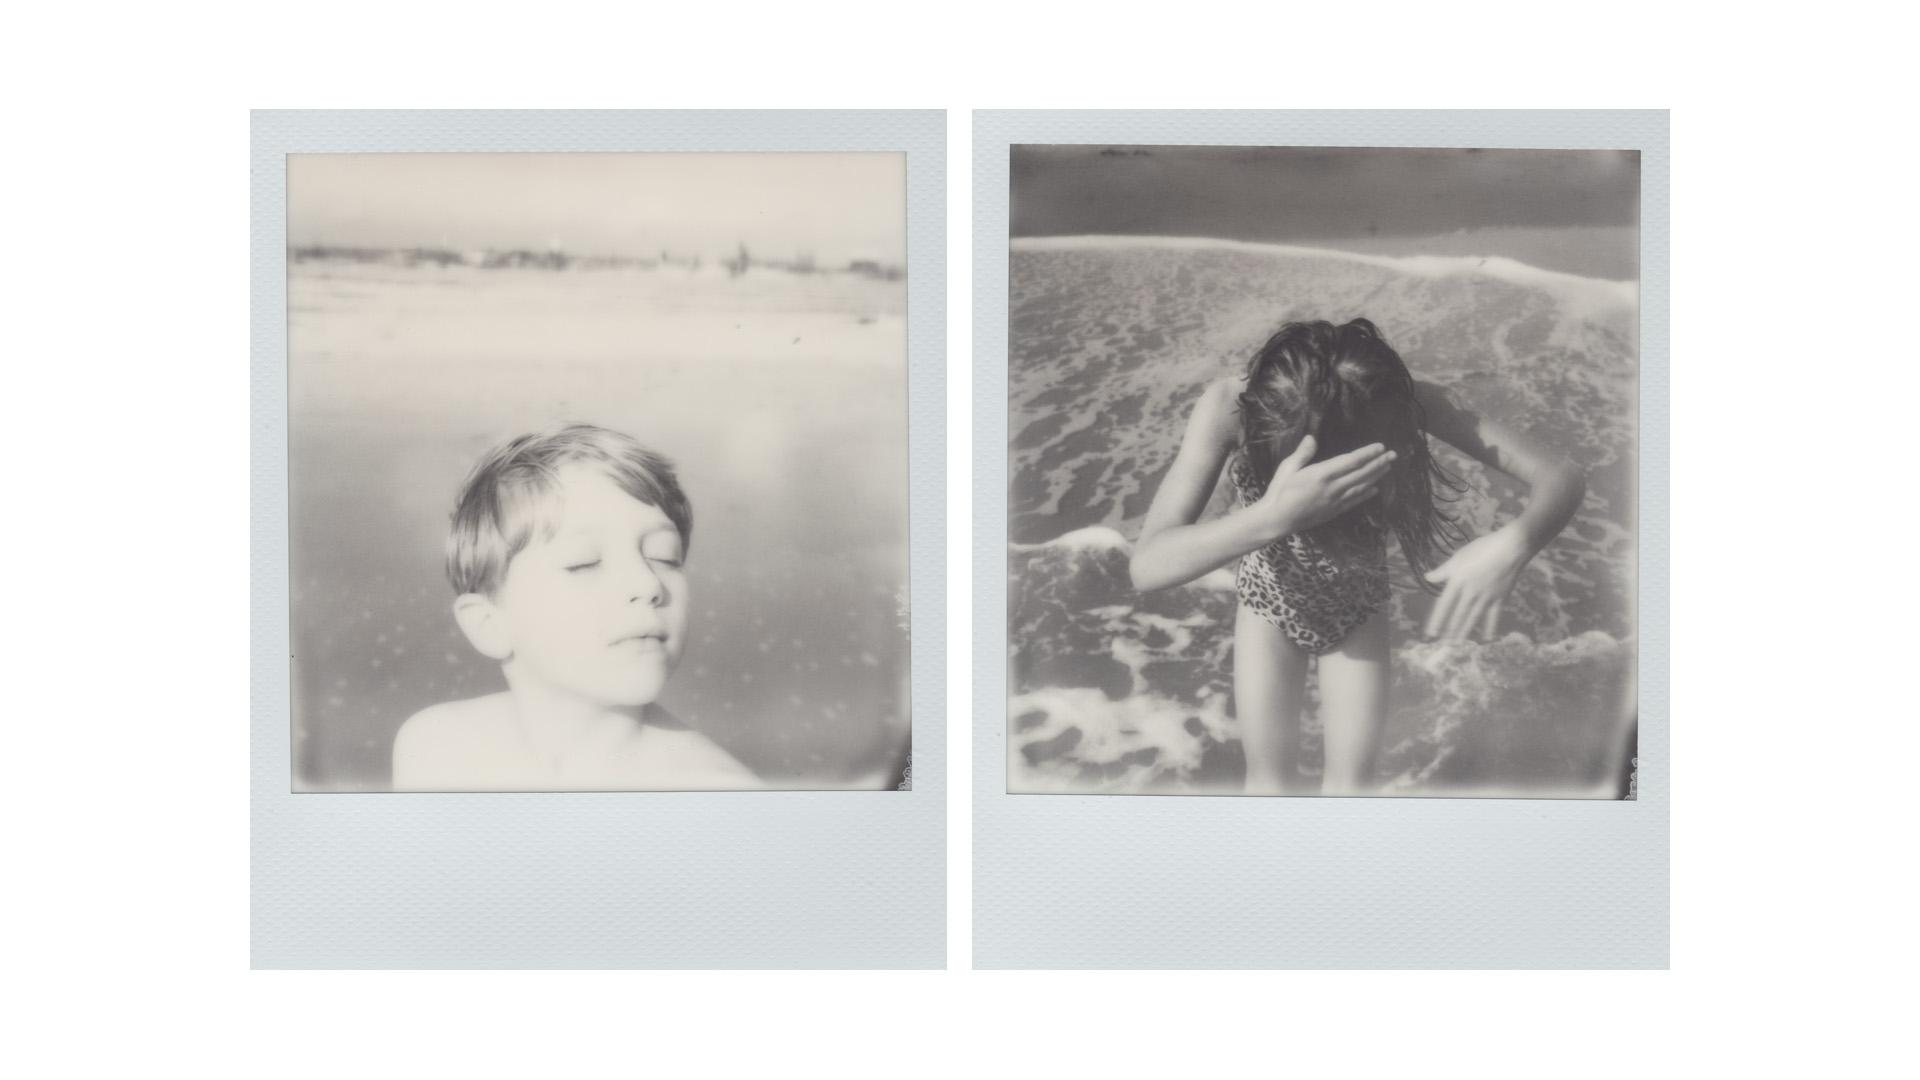 polaroid portraits of my children // (c) jocelynmathewes.com